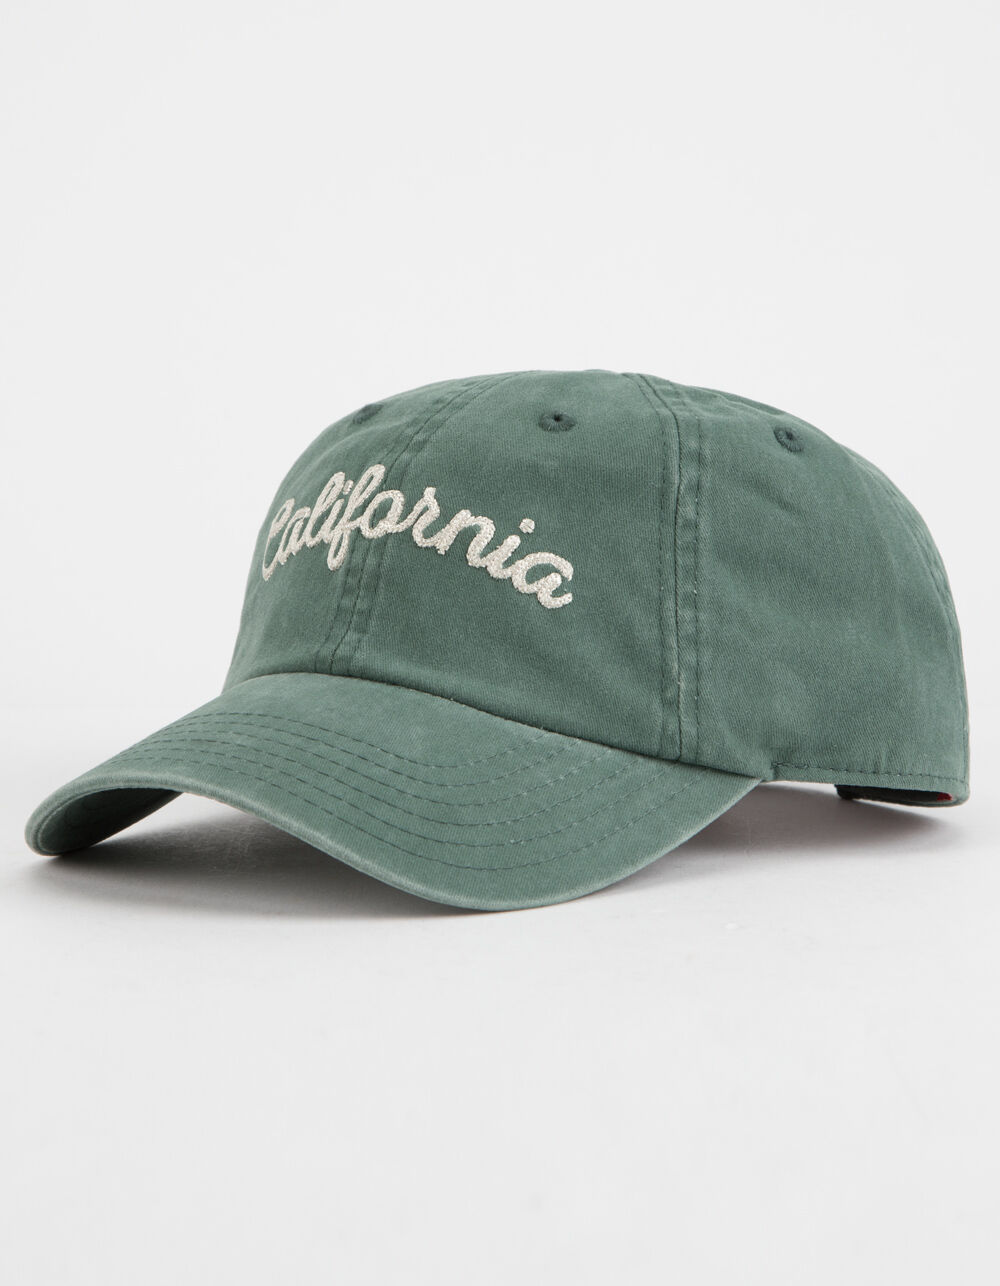 Image of AMERICAN NEEDLE CALIFORNIA DAD HAT